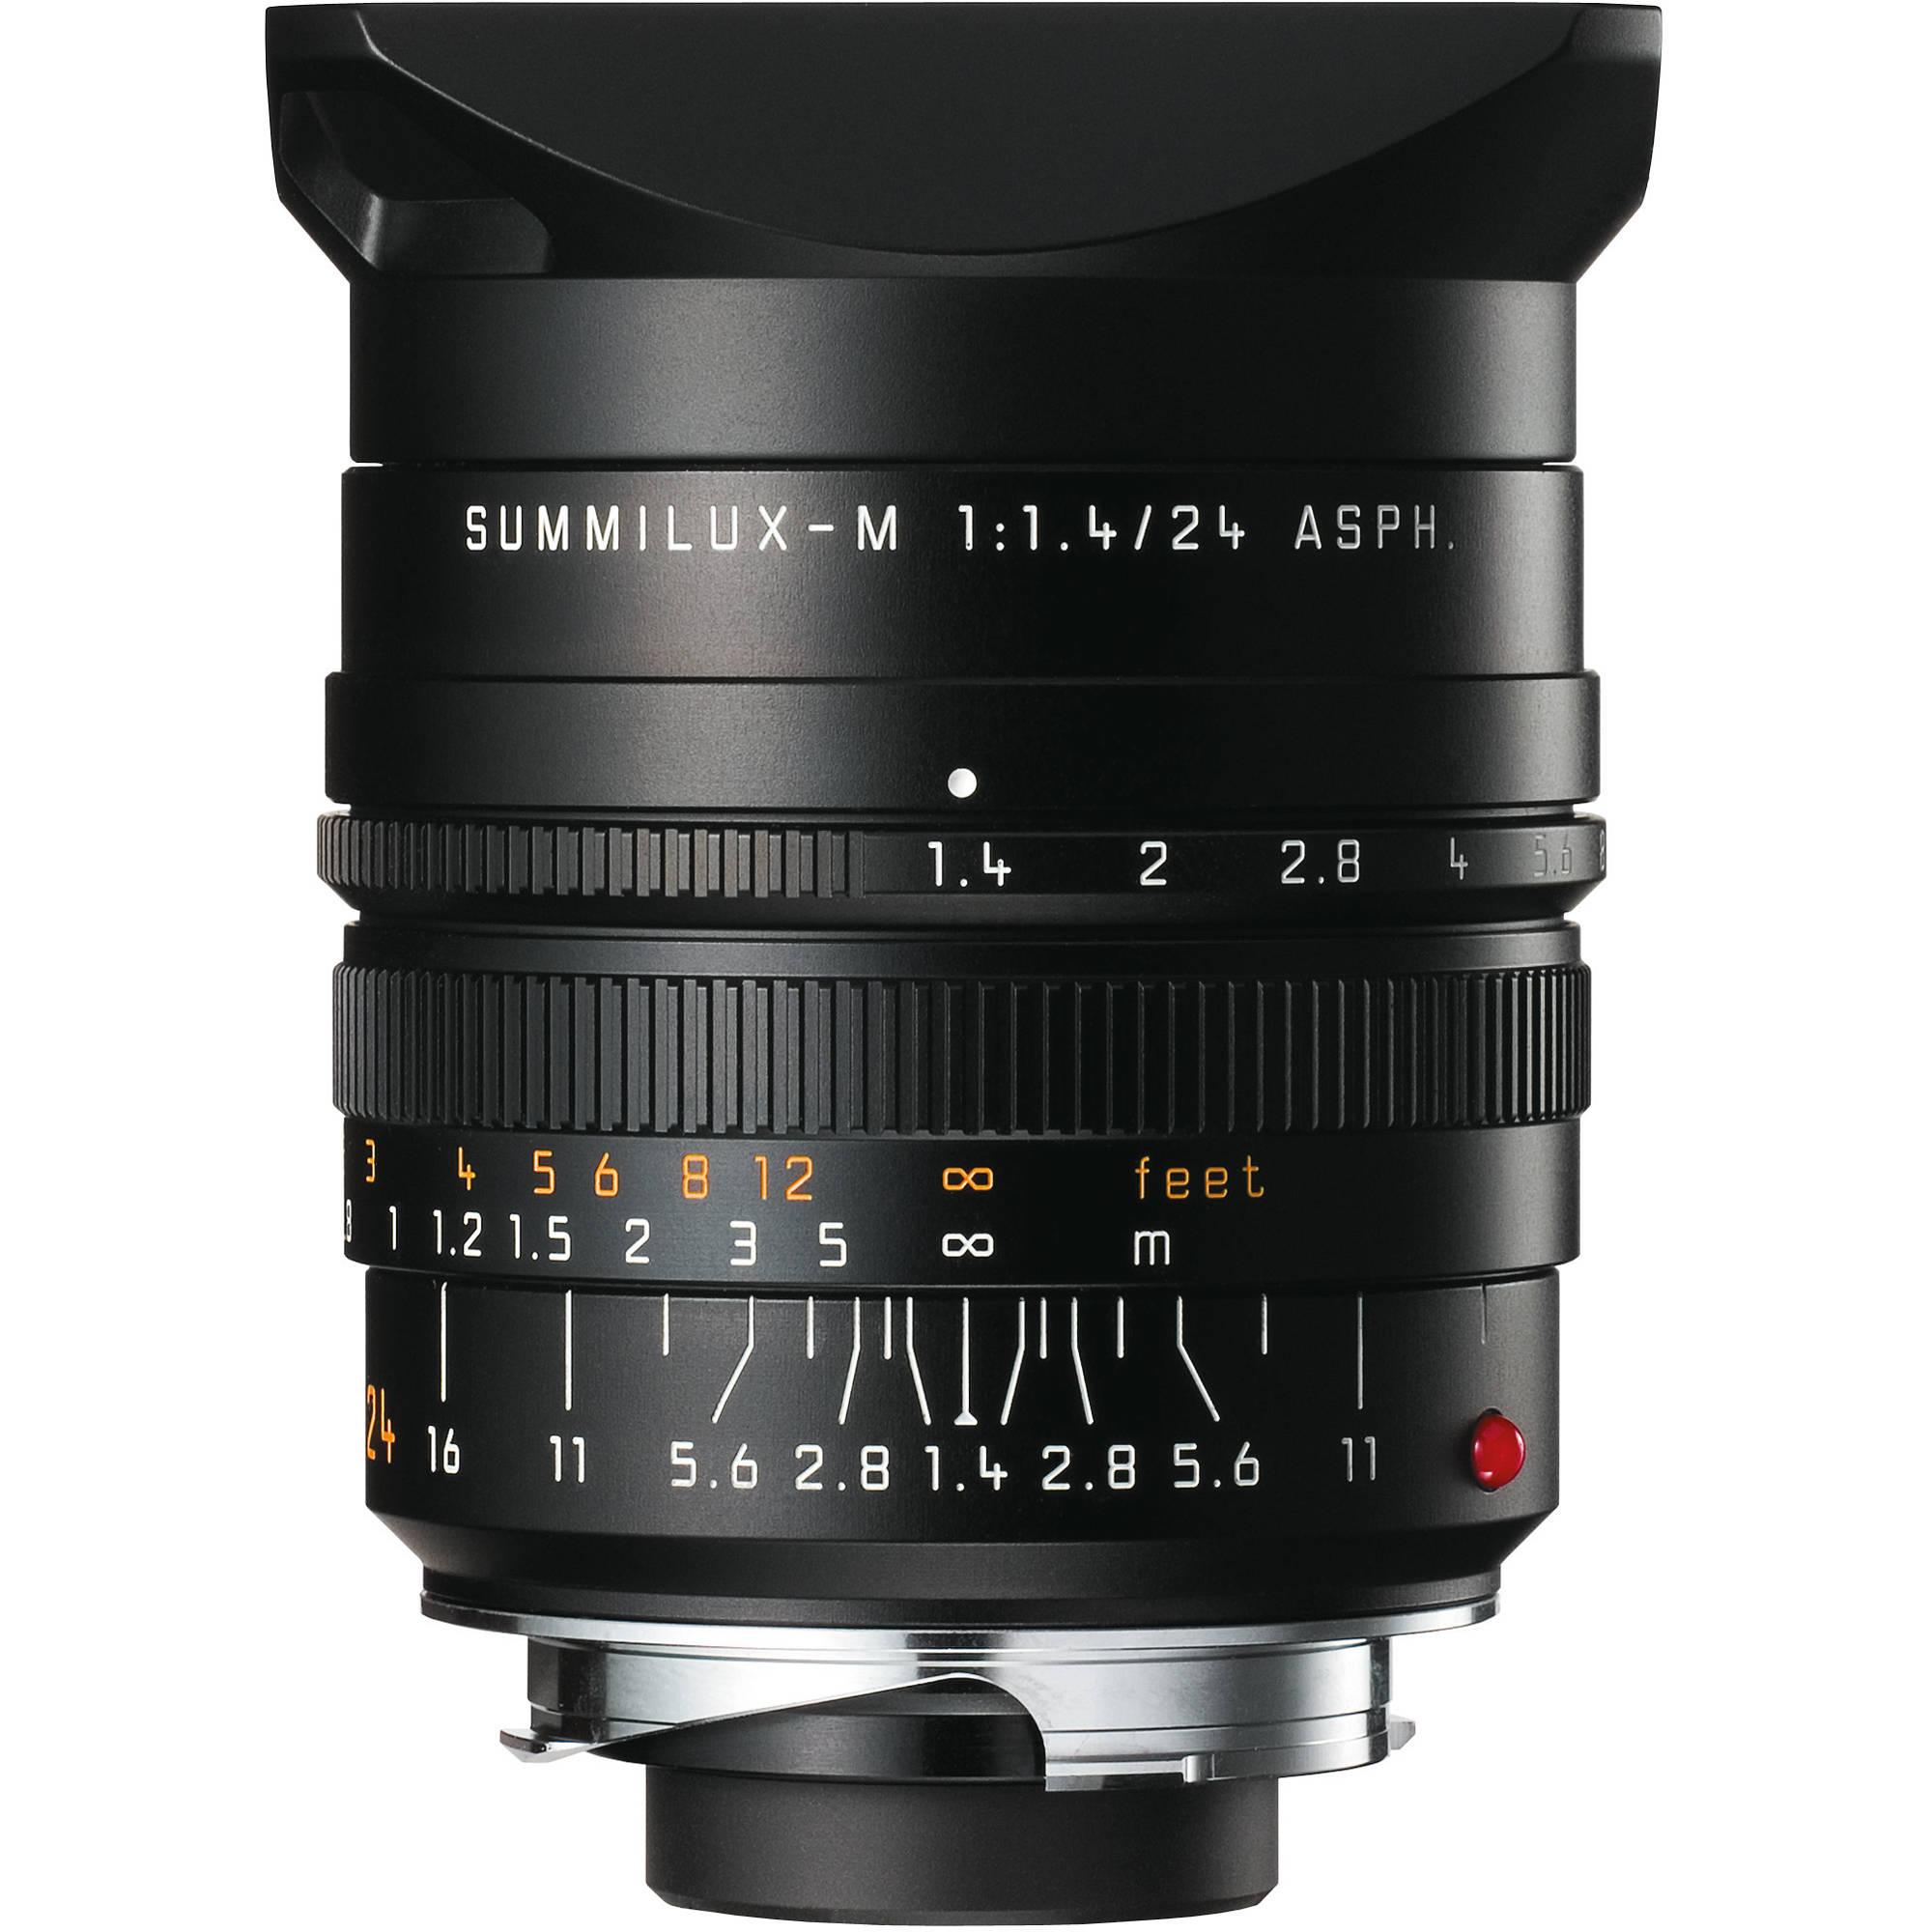 Leica Summilux M 24mm f/1,4 ASPH